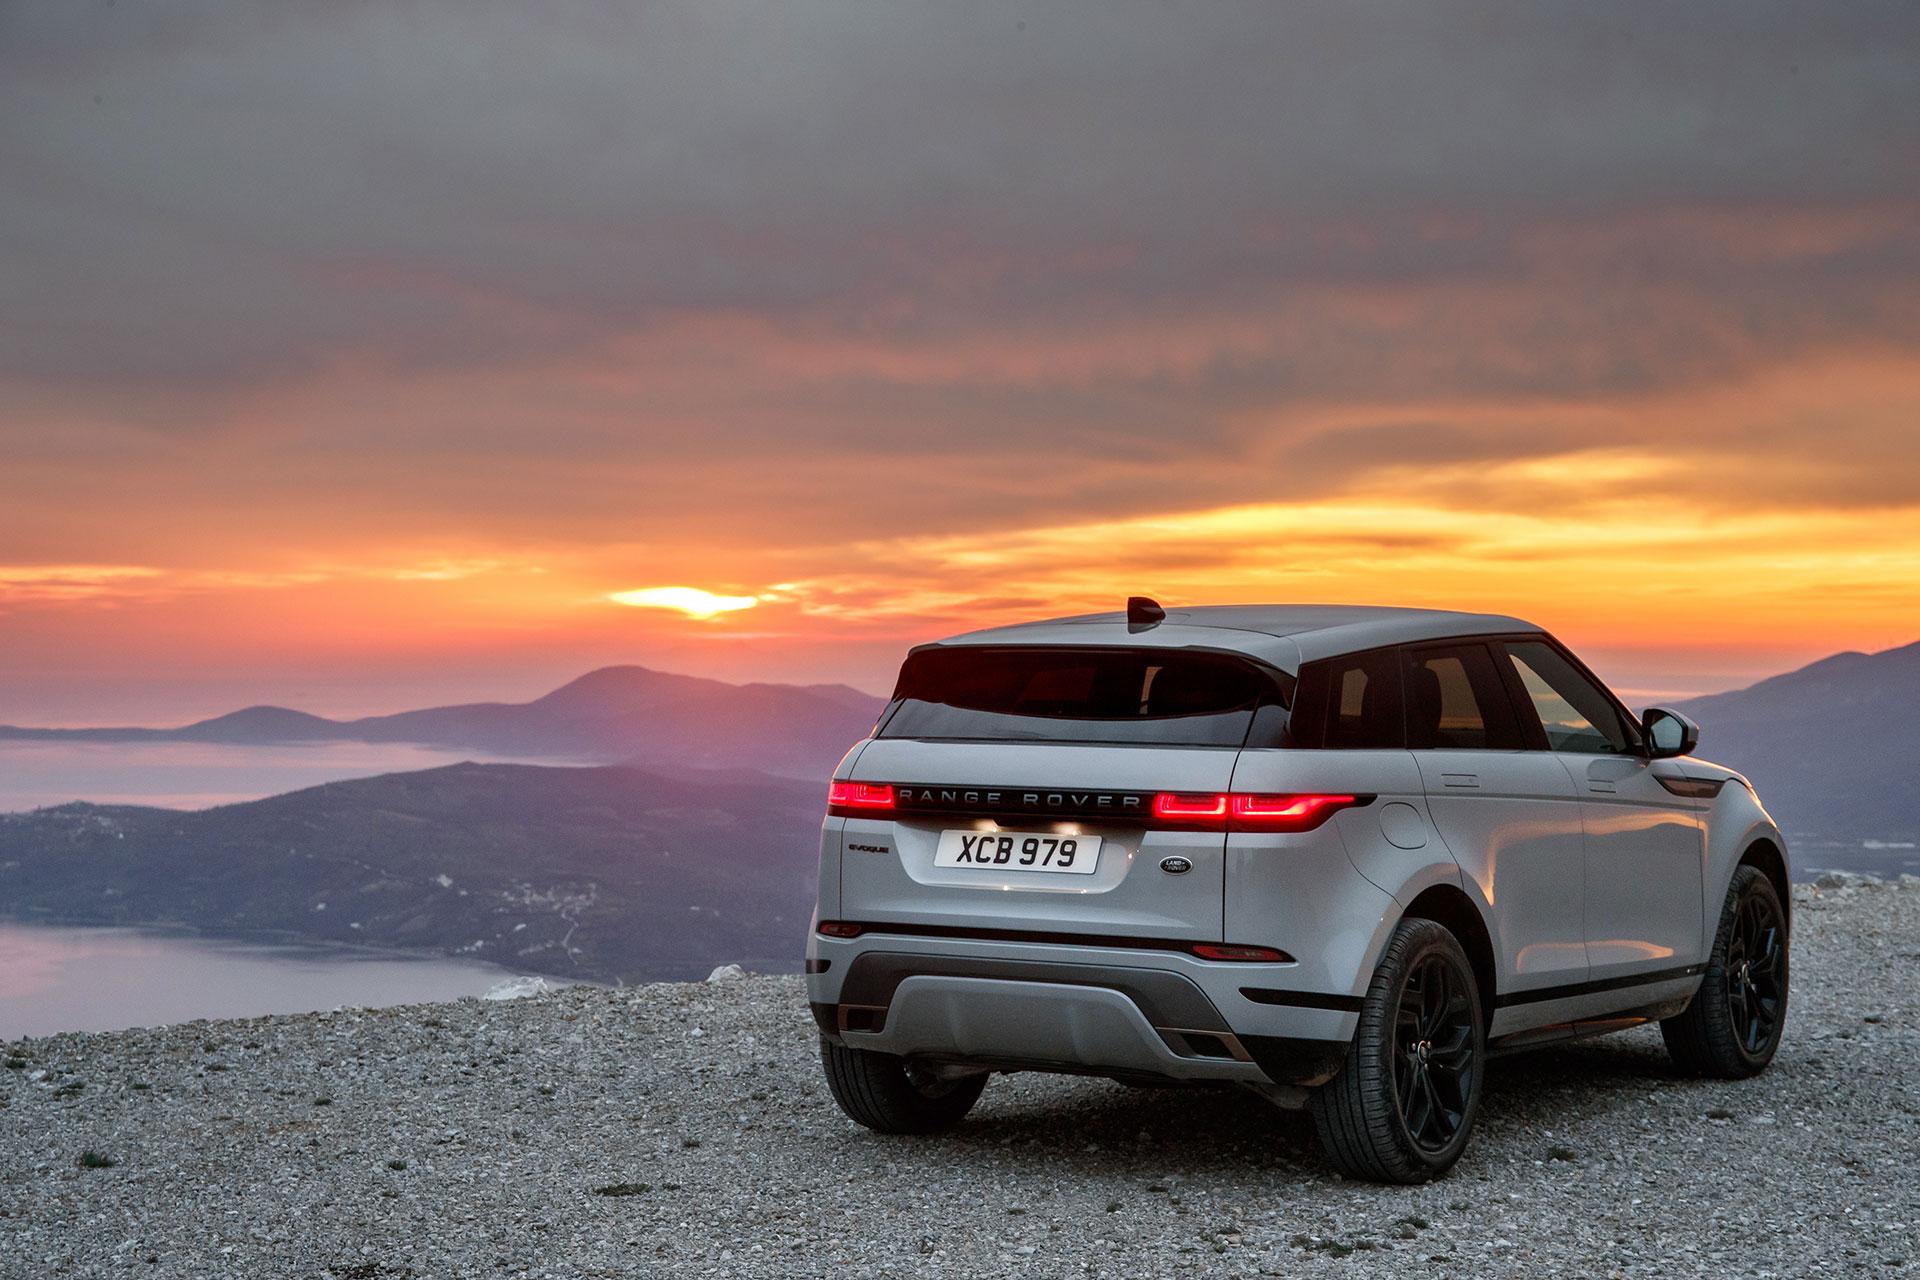 Range Rover Evoque 2019 Gris Exterior 12